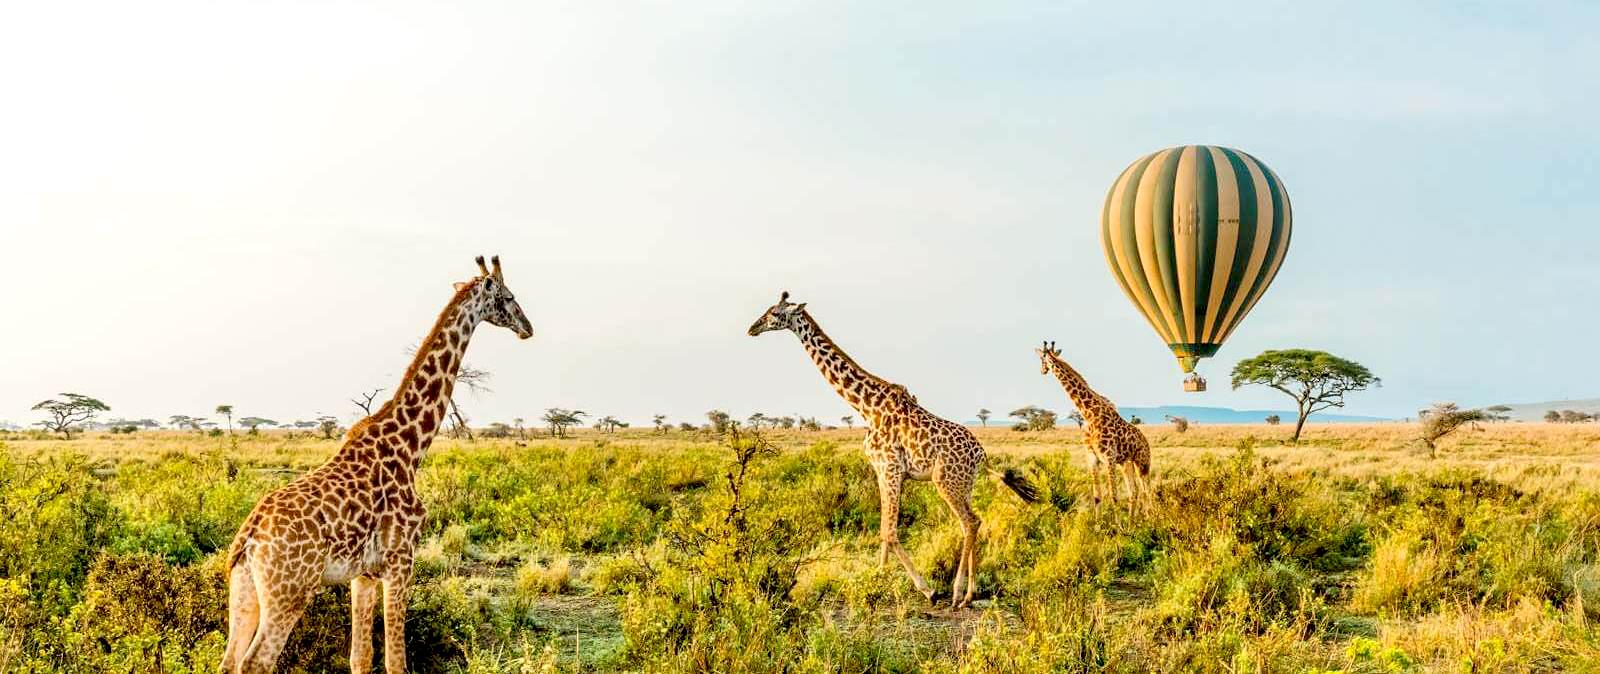 Hot air balloon Safari Tanzania